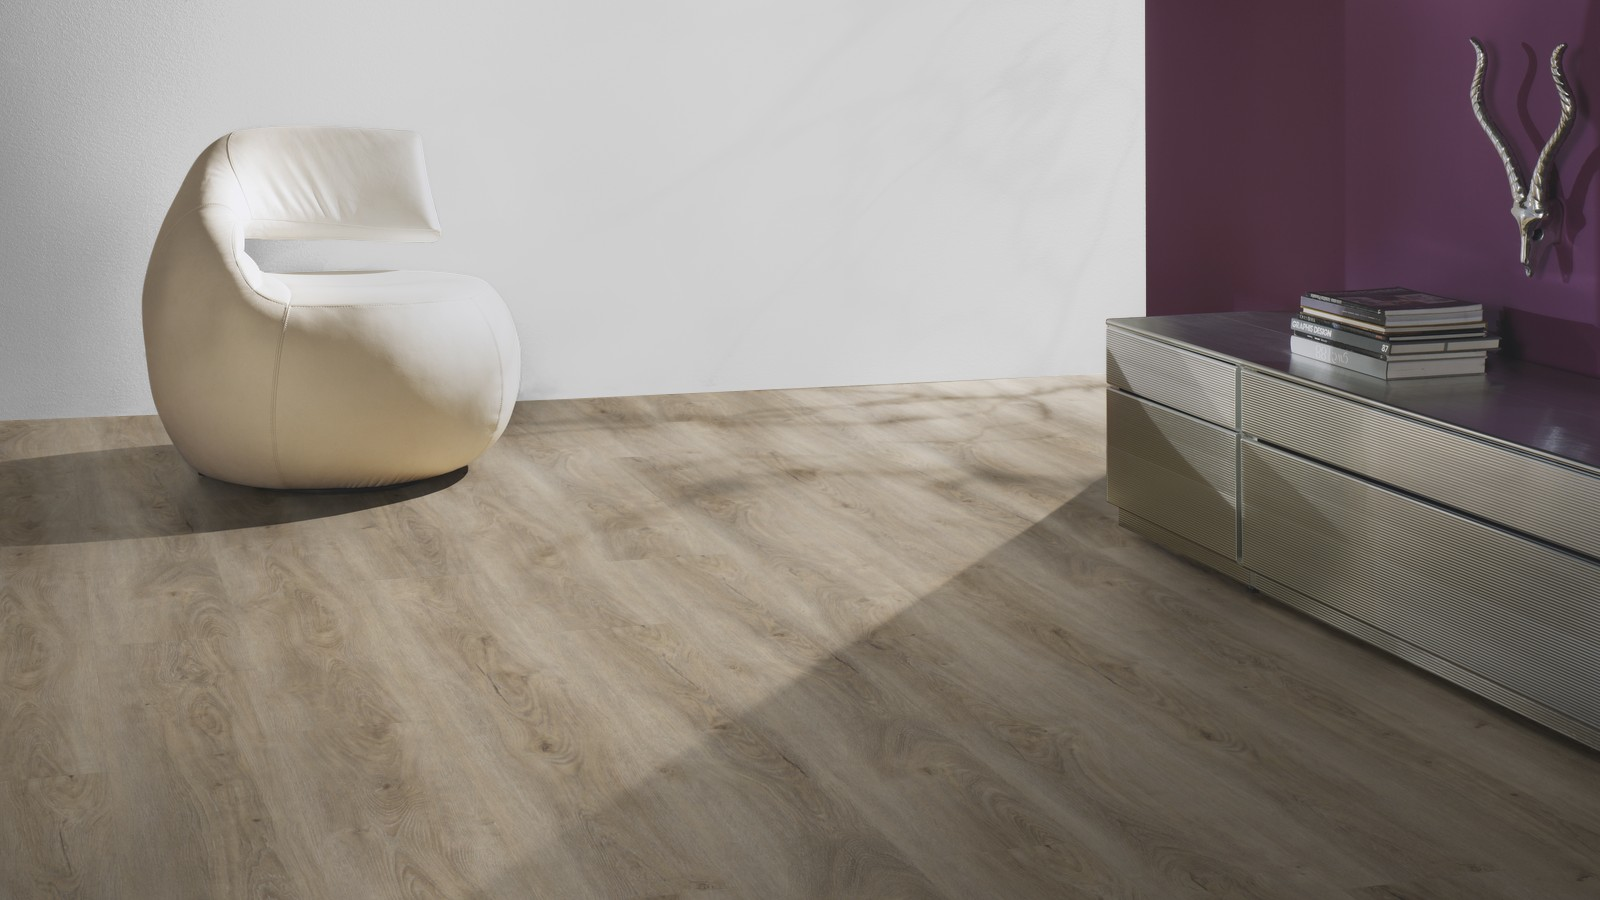 terh rne vinyl 9 mm klick eiche minsk graubeige inkl trittschall g08 bright choice. Black Bedroom Furniture Sets. Home Design Ideas